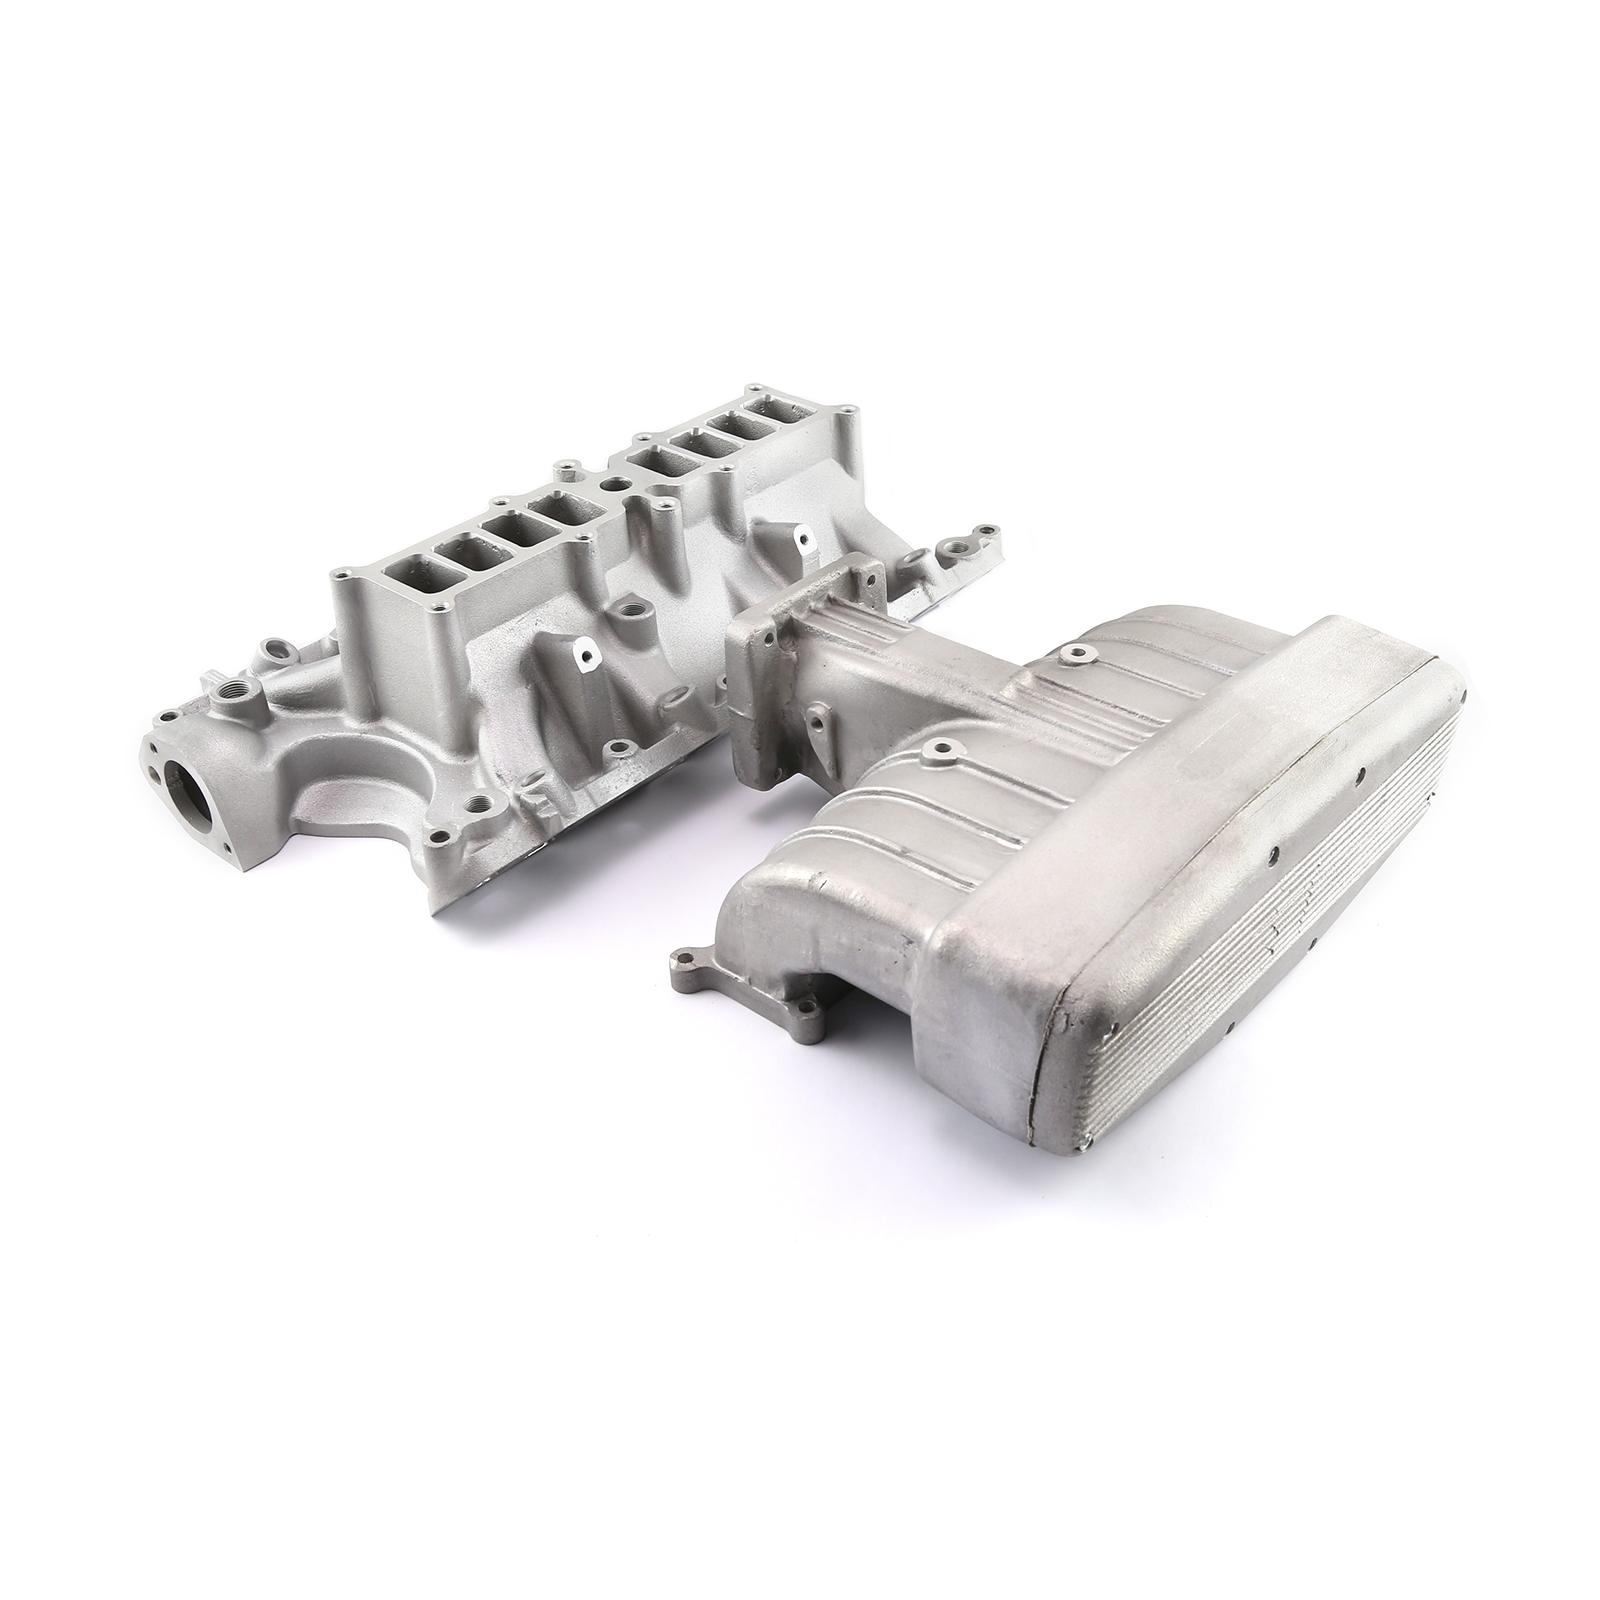 Speedmaster® PCE148.1015 Ford 5.0L EFI 1986-93 Qualifier Complete Intake Manifold System Satin